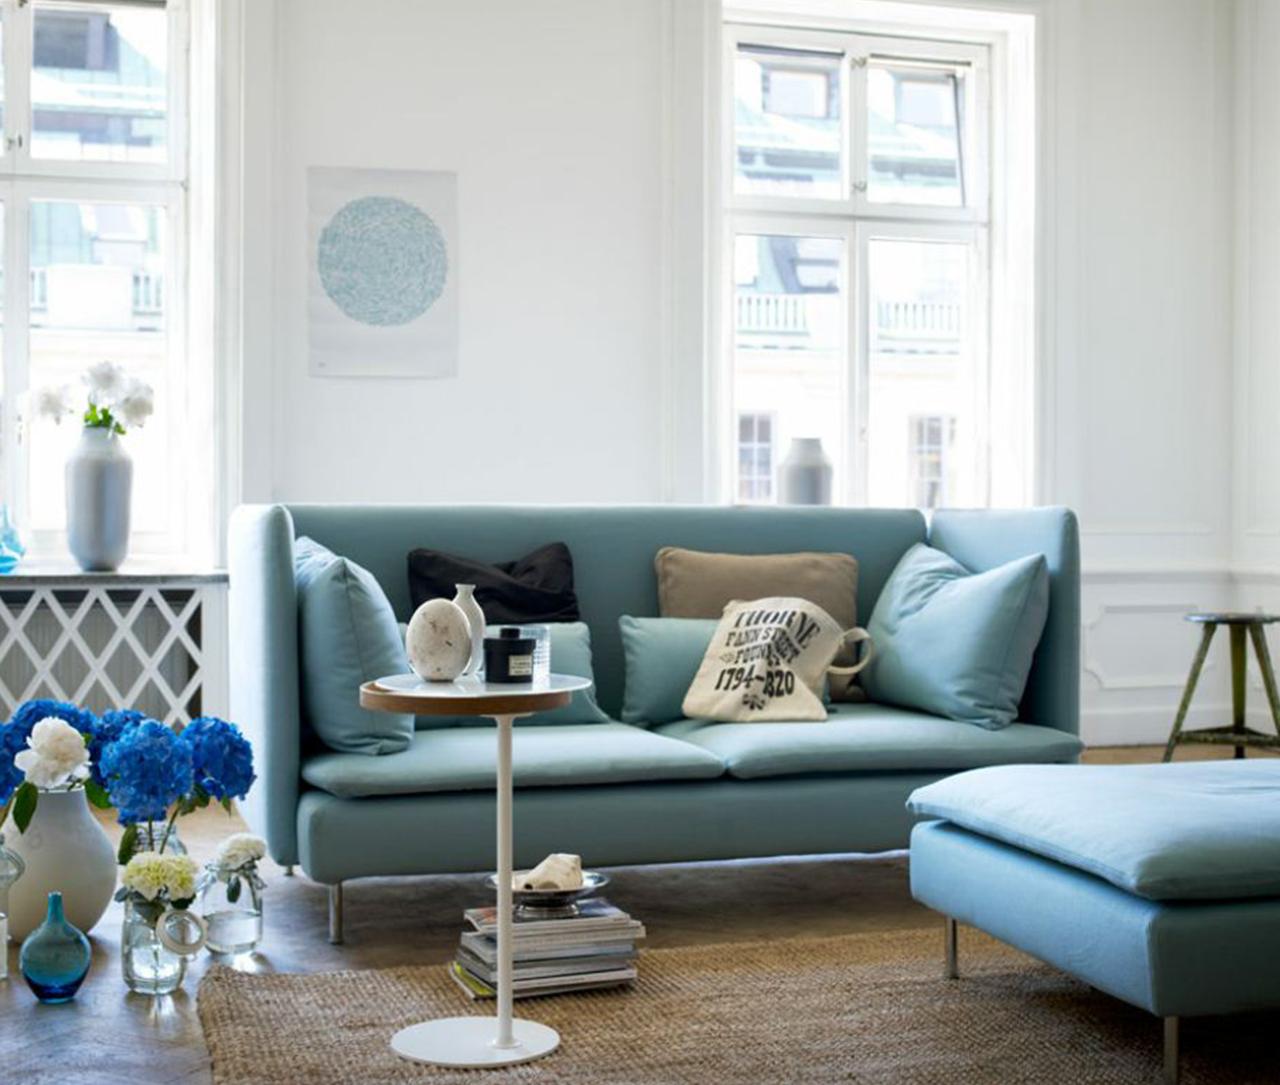 canap s derhamn. Black Bedroom Furniture Sets. Home Design Ideas